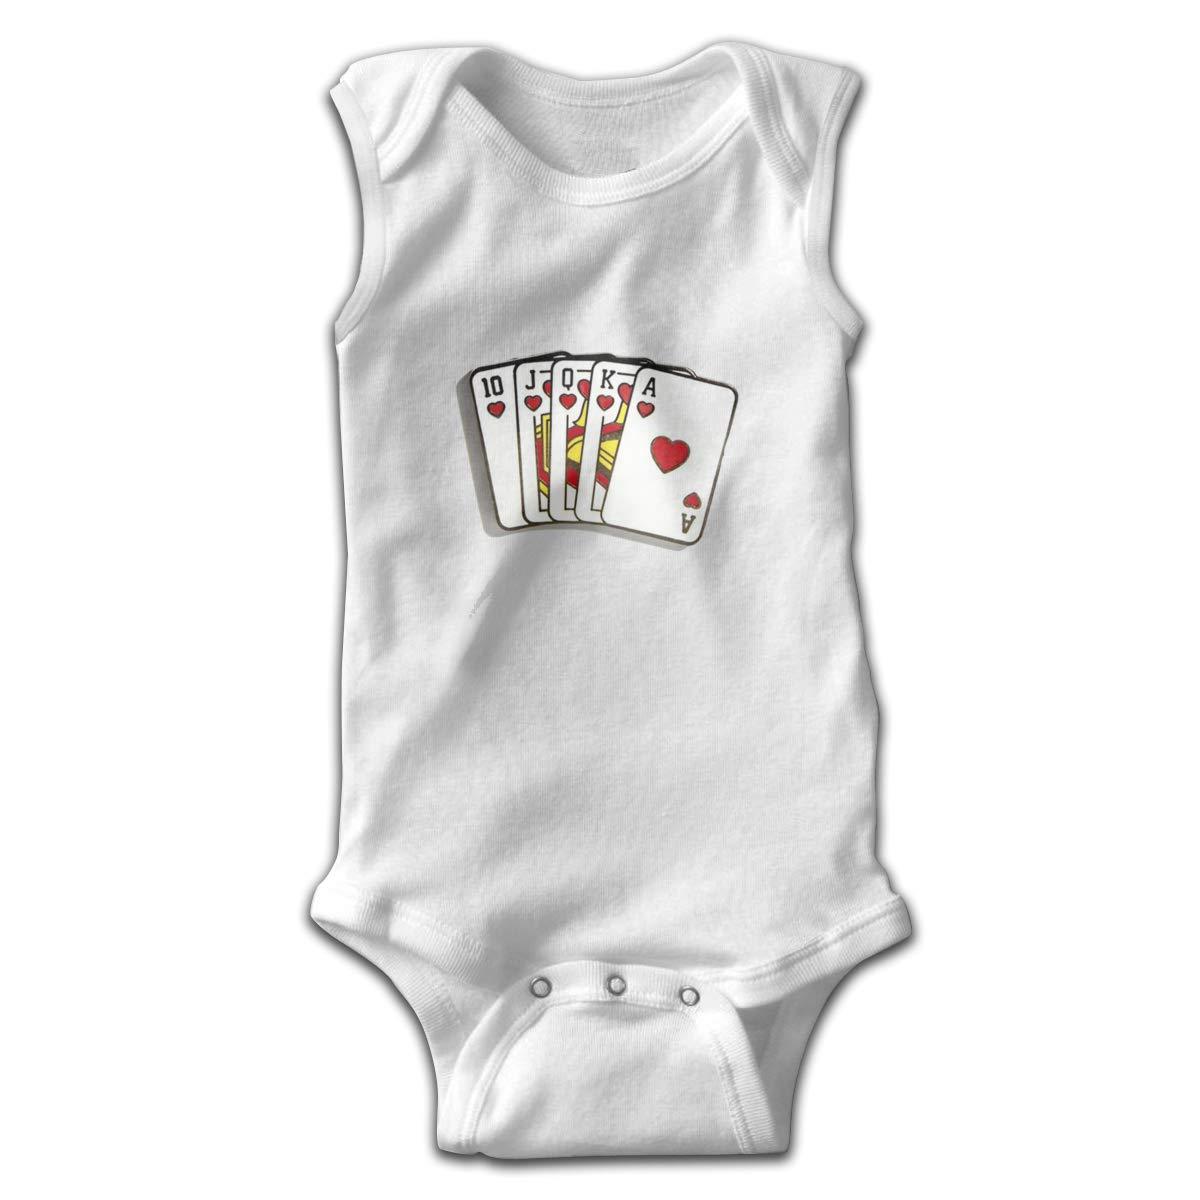 Royal Flush Newborn Baby No Sleeve Bodysuit Romper Infant Summer Clothing Black